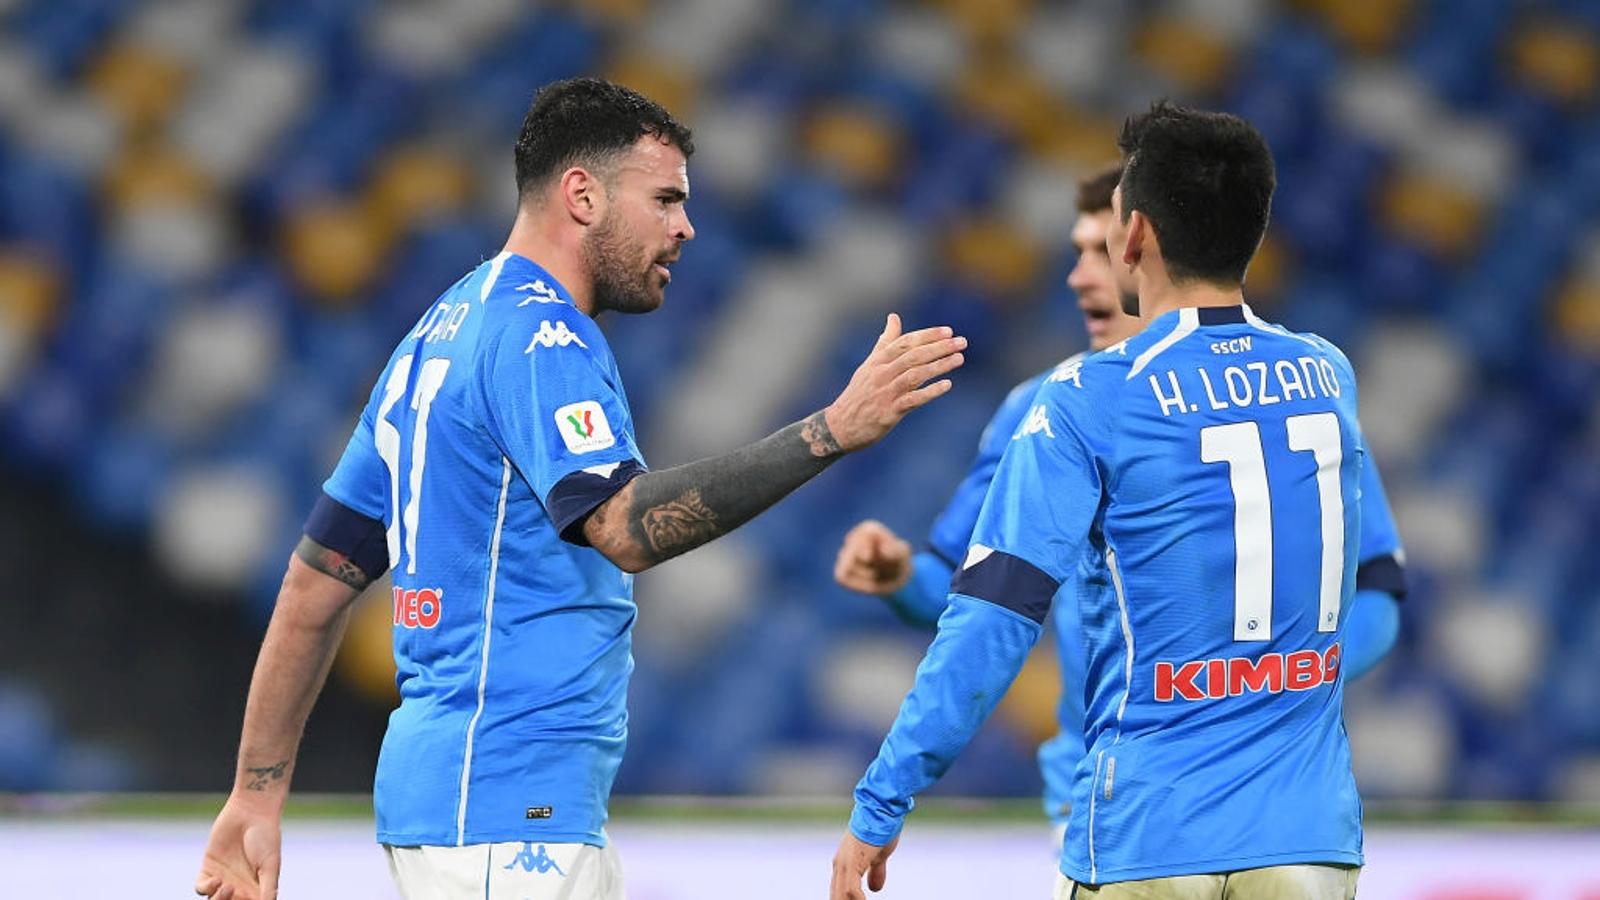 Napoli - Empoli 3-2   La partita - Calcio - Rai Sport